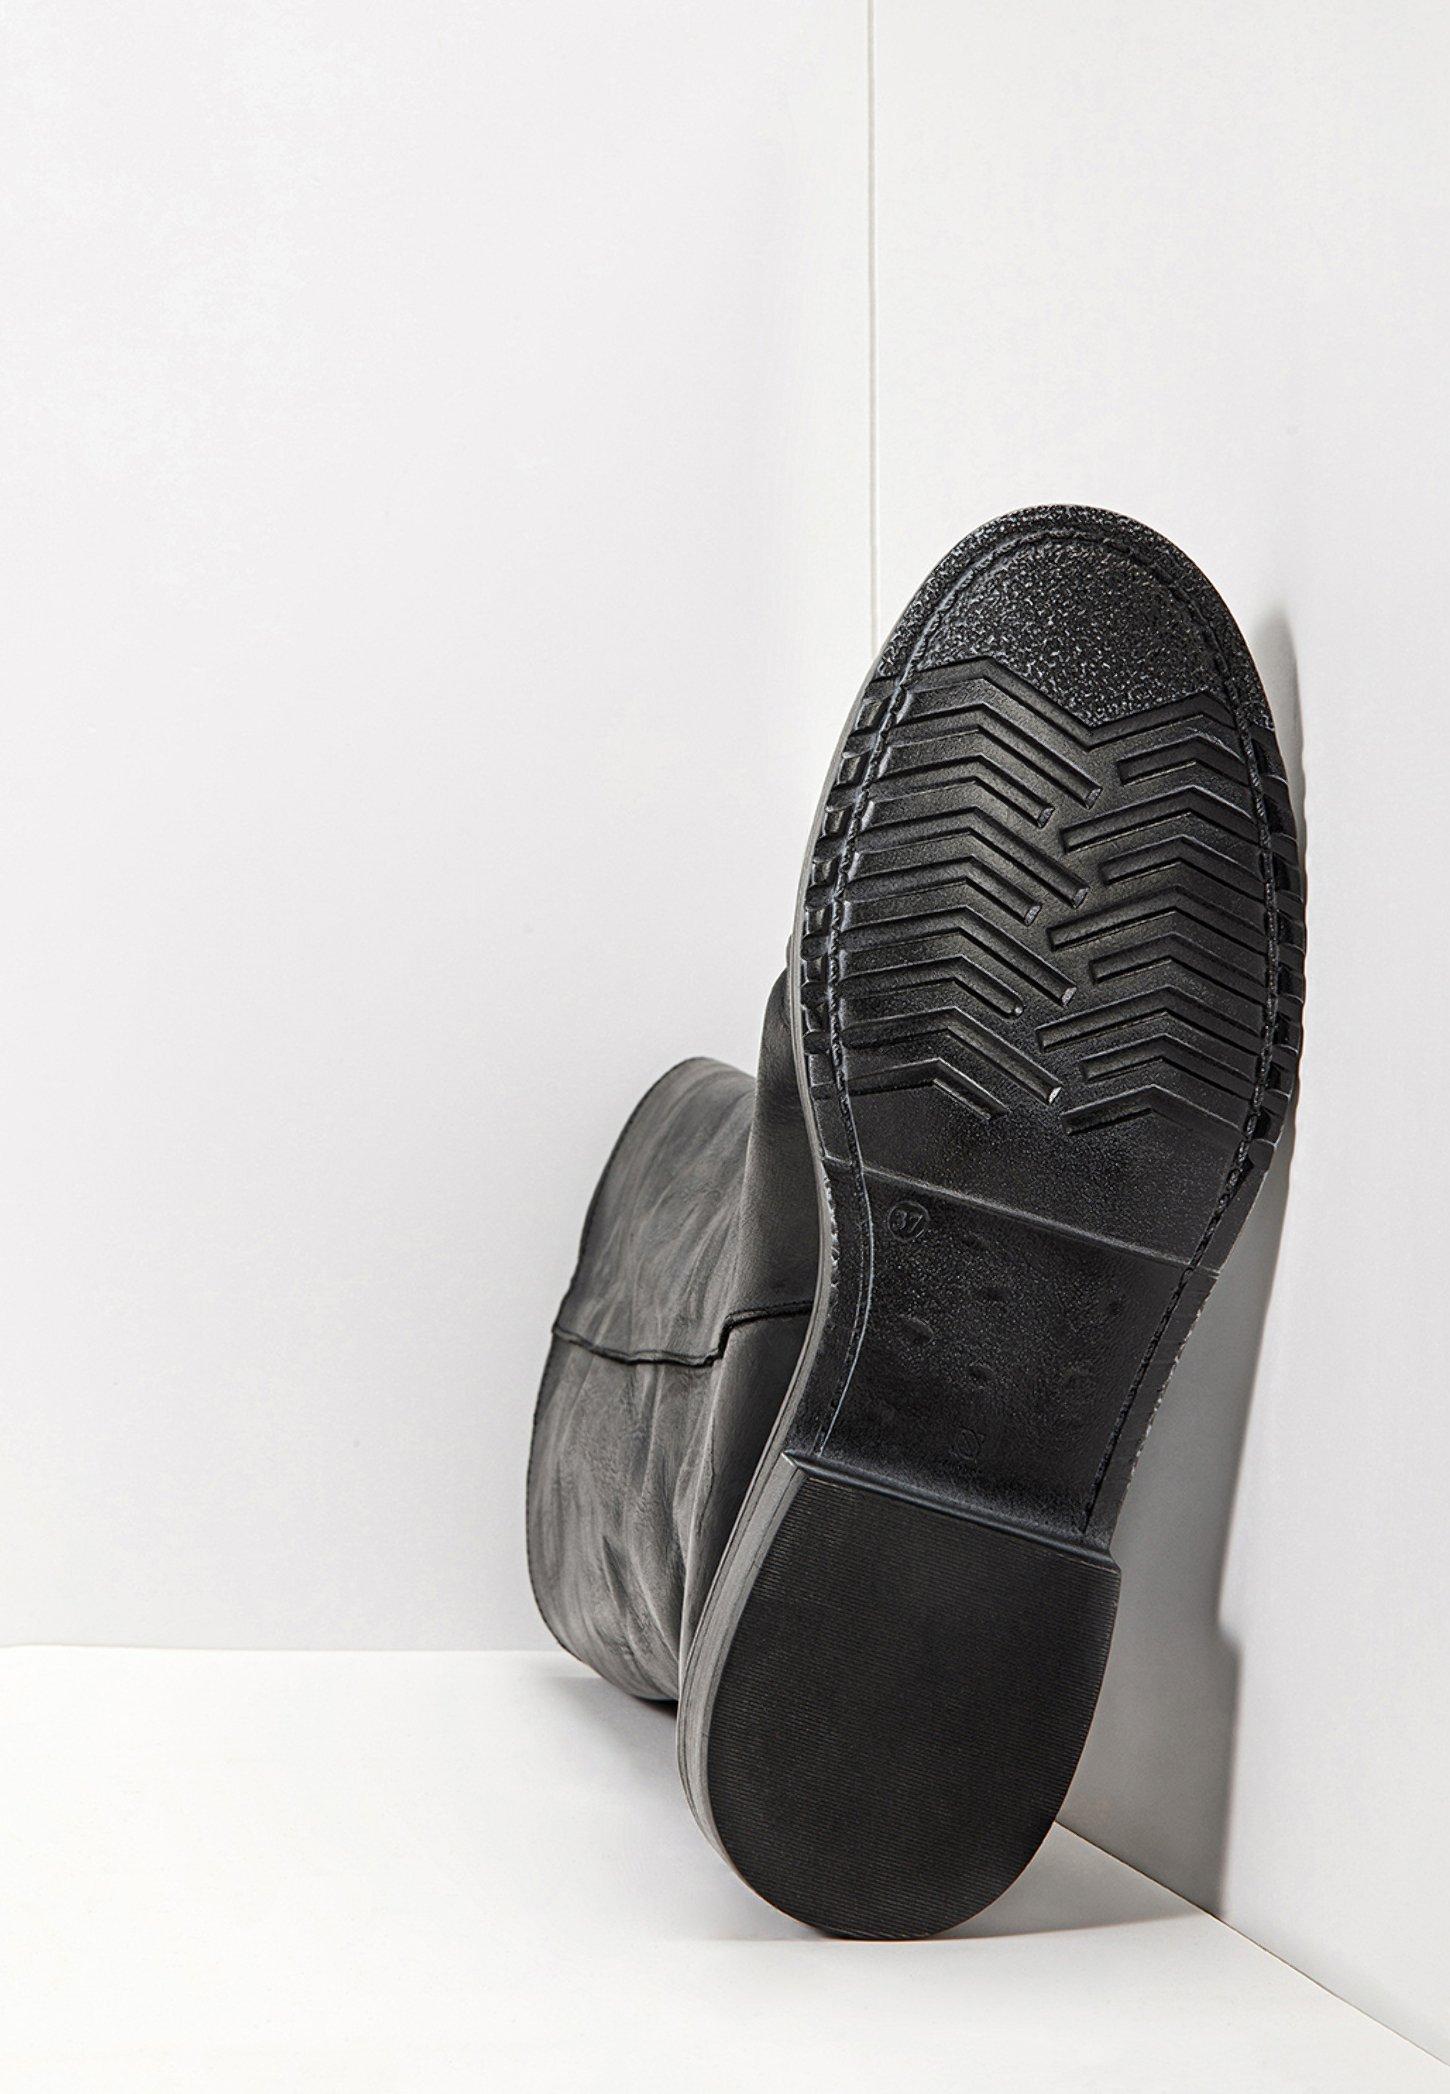 Inuovo Plateaustiefel blackblk/schwarz